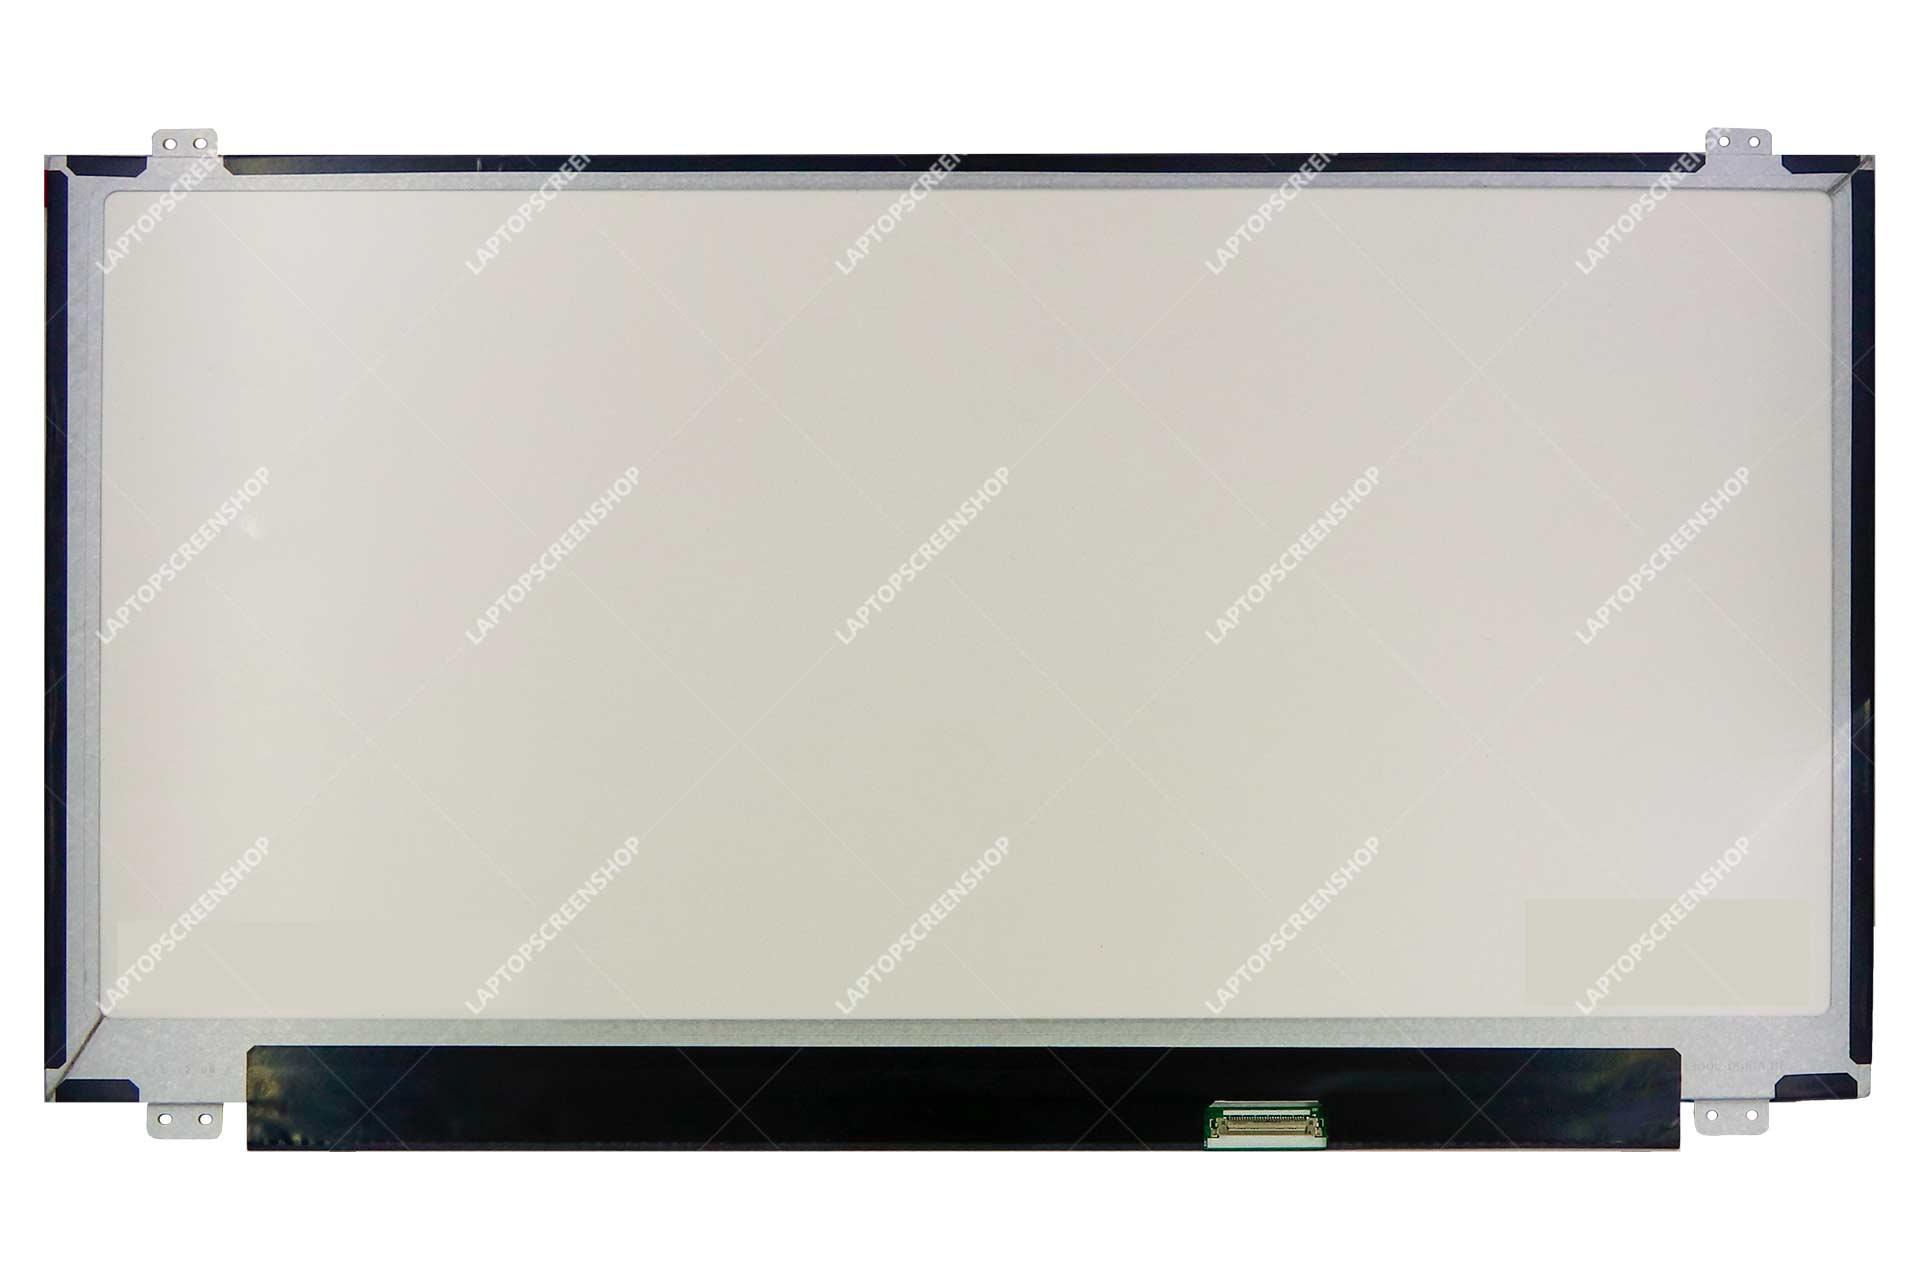 ACER-ASPIRE-E1-432-4675-LCD-LCD |HD|فروشگاه لپ تاپ اسکرين | تعمير لپ تاپ